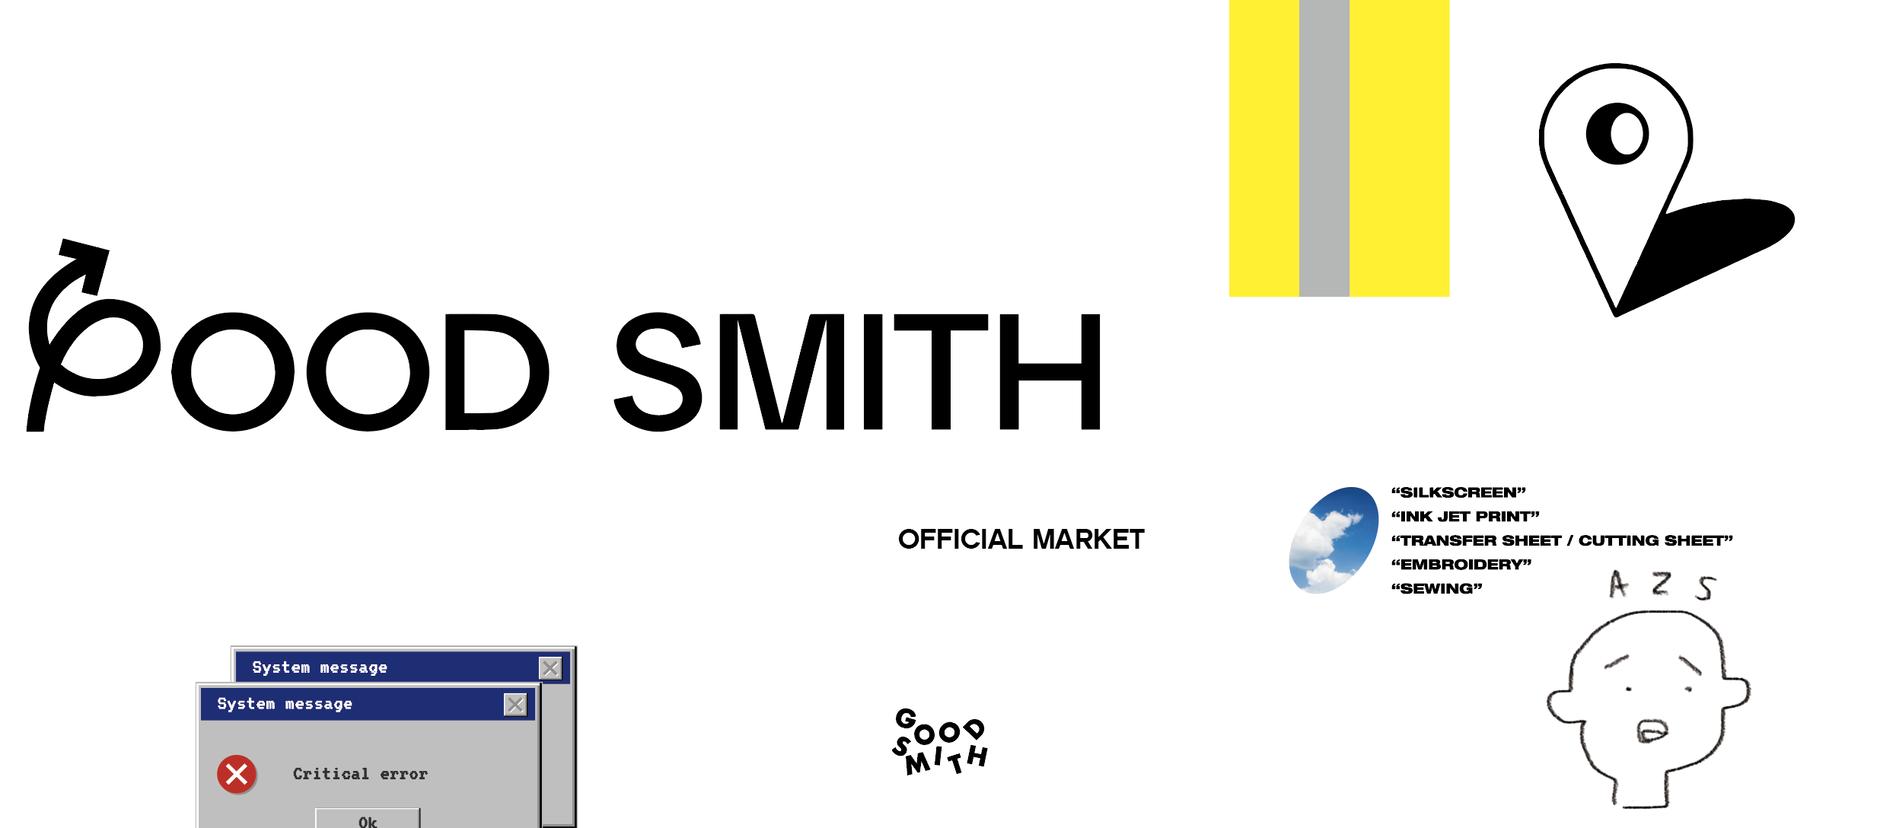 GOOD SMITH MARKET